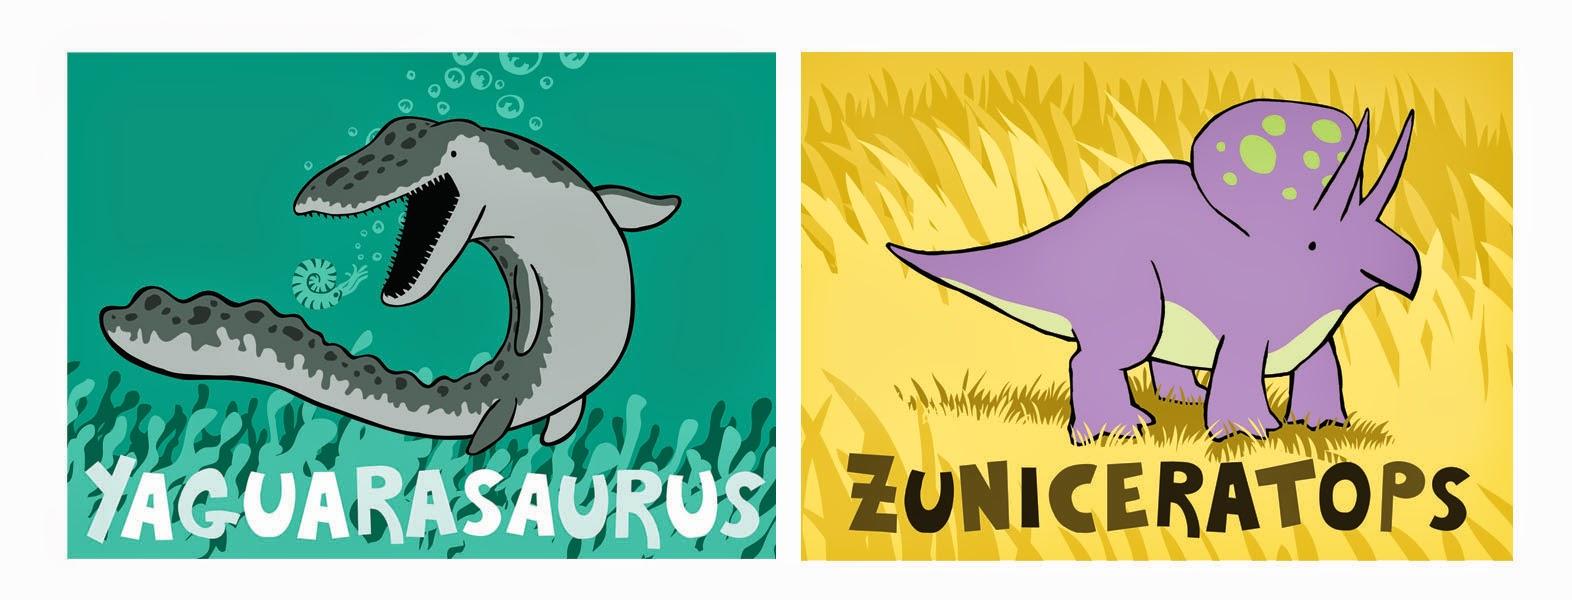 Yaguarasaurus Zuniceratops